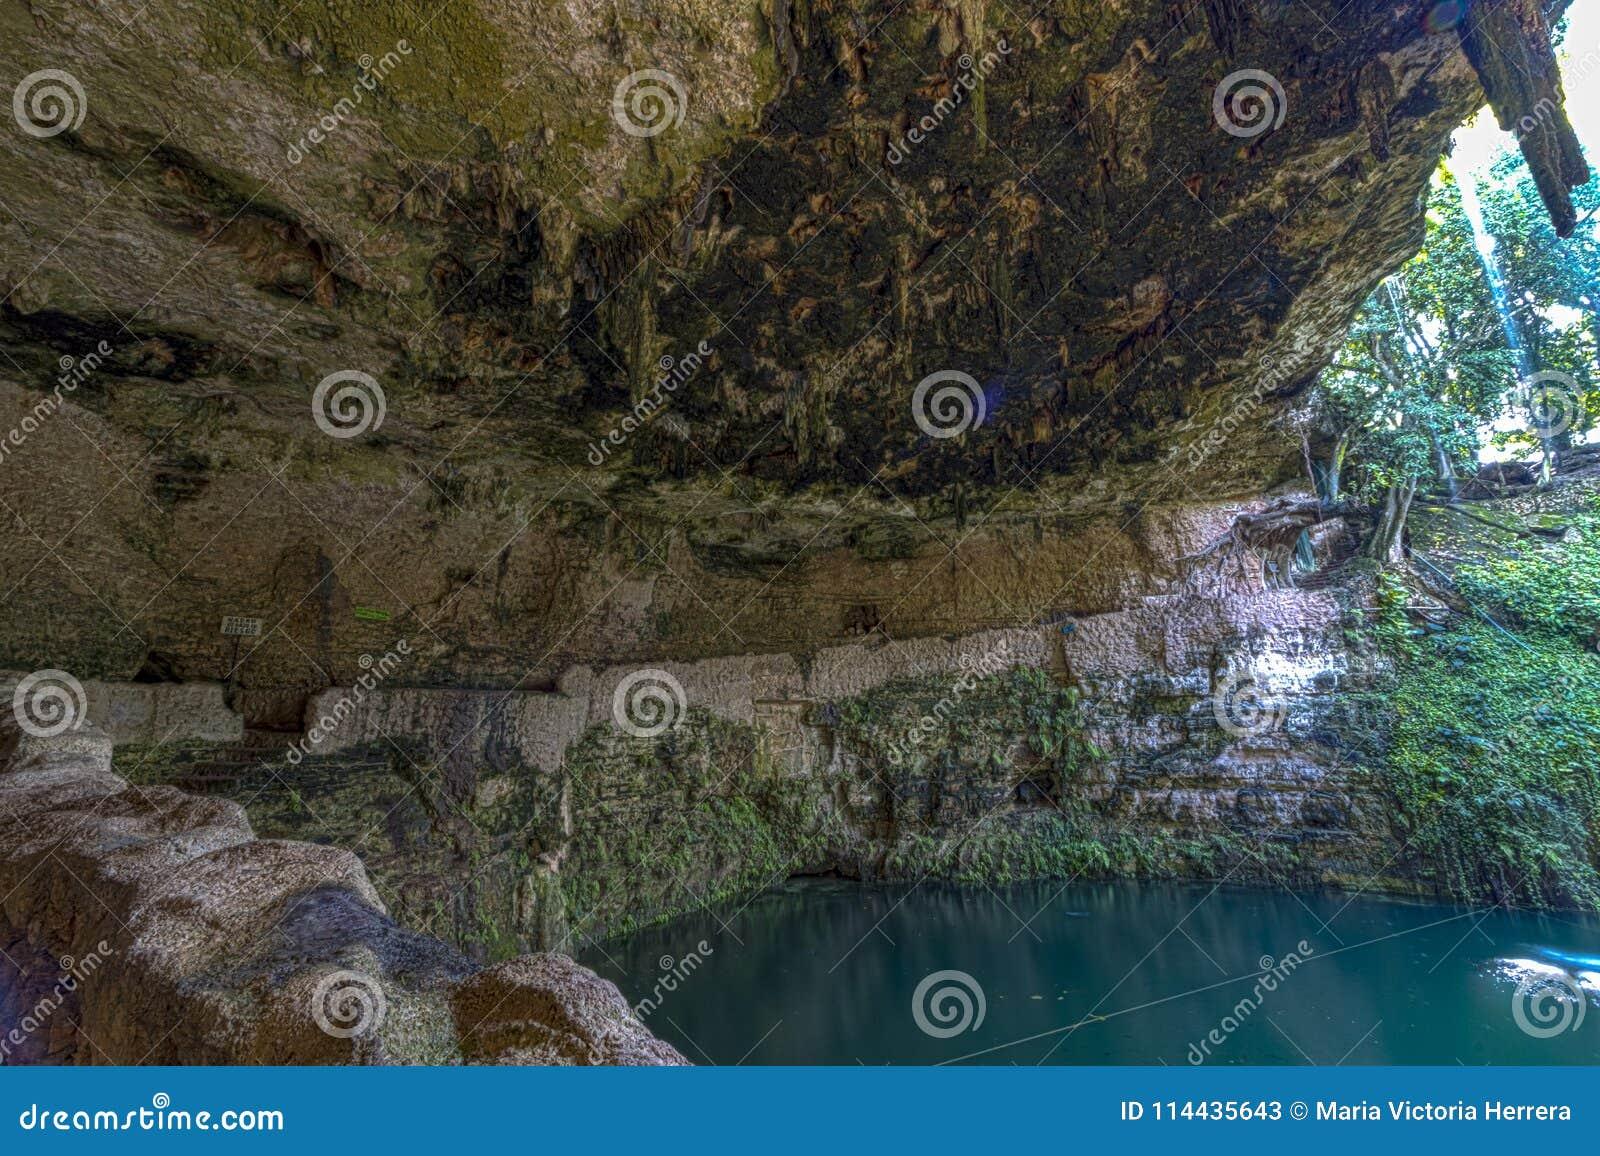 Natuurlijke sinkhole in Mexico